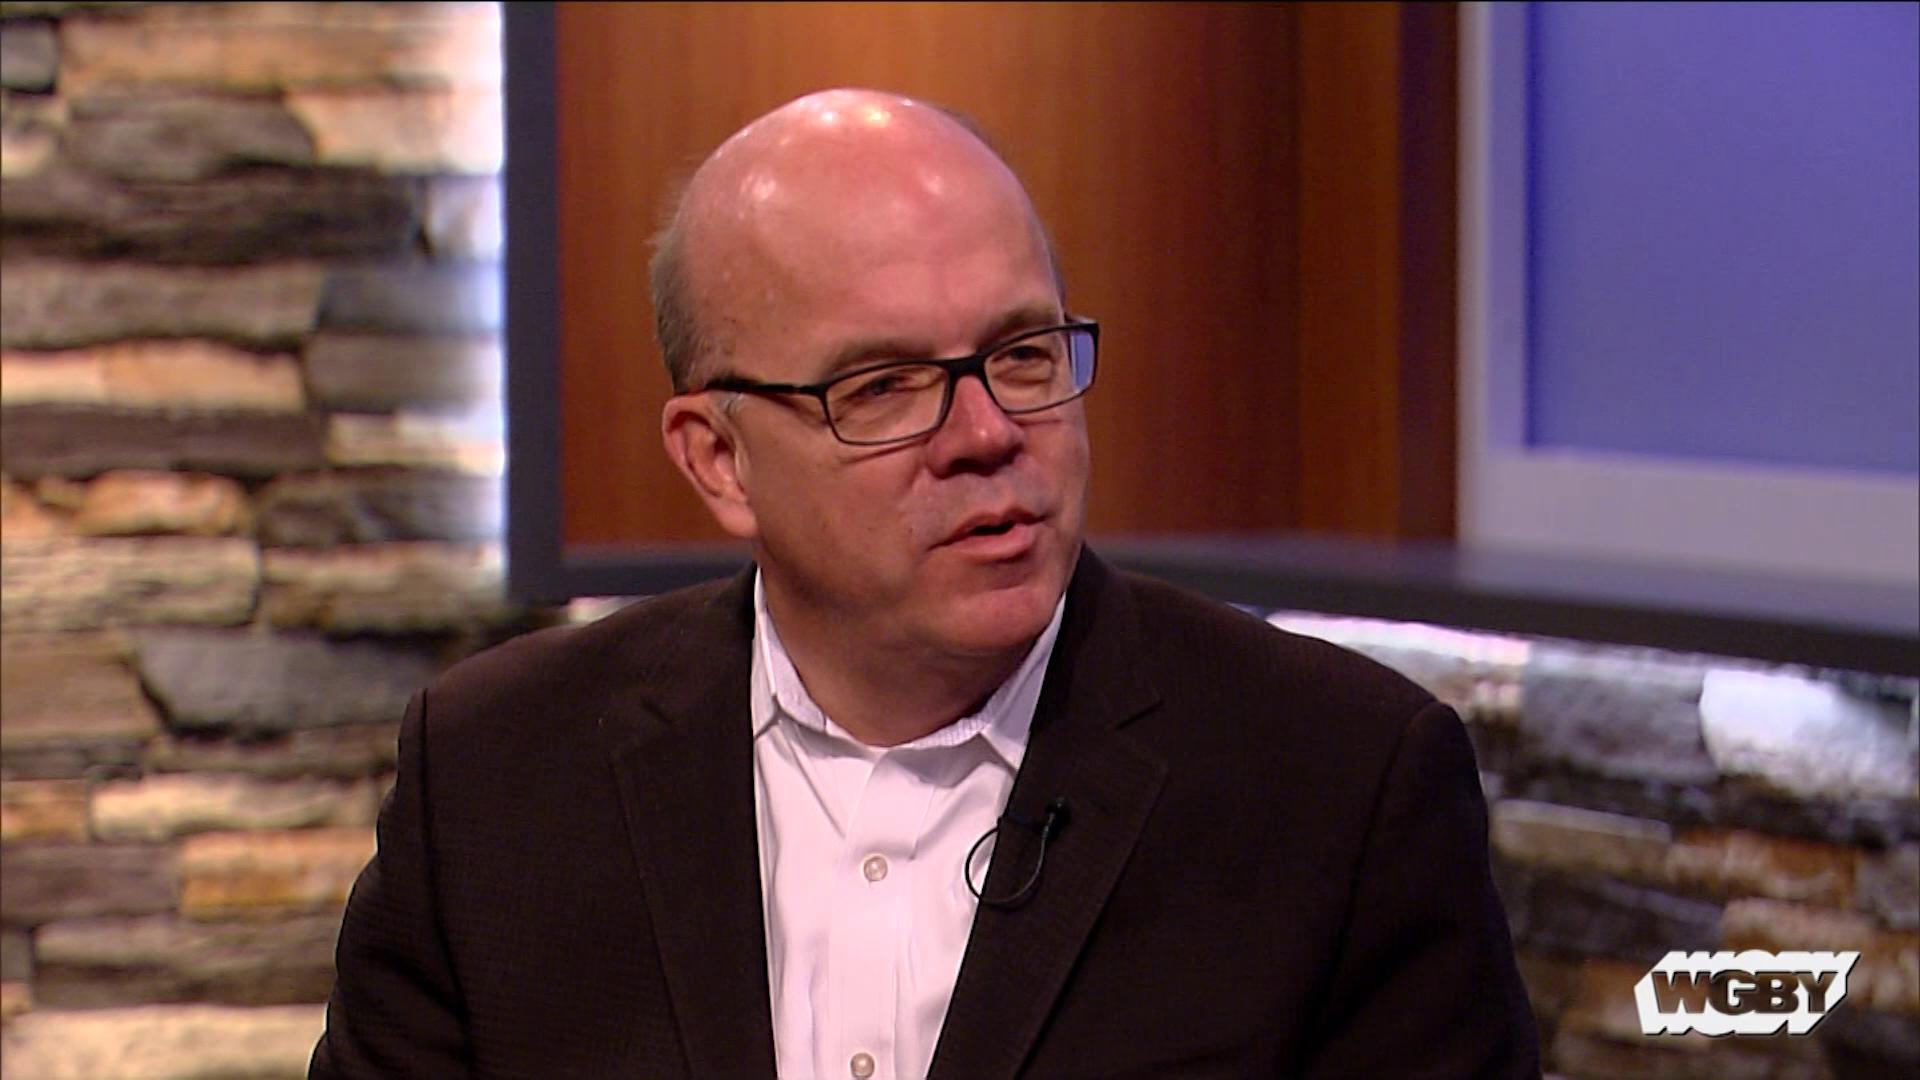 Meet the Candidates: Jim McGovern